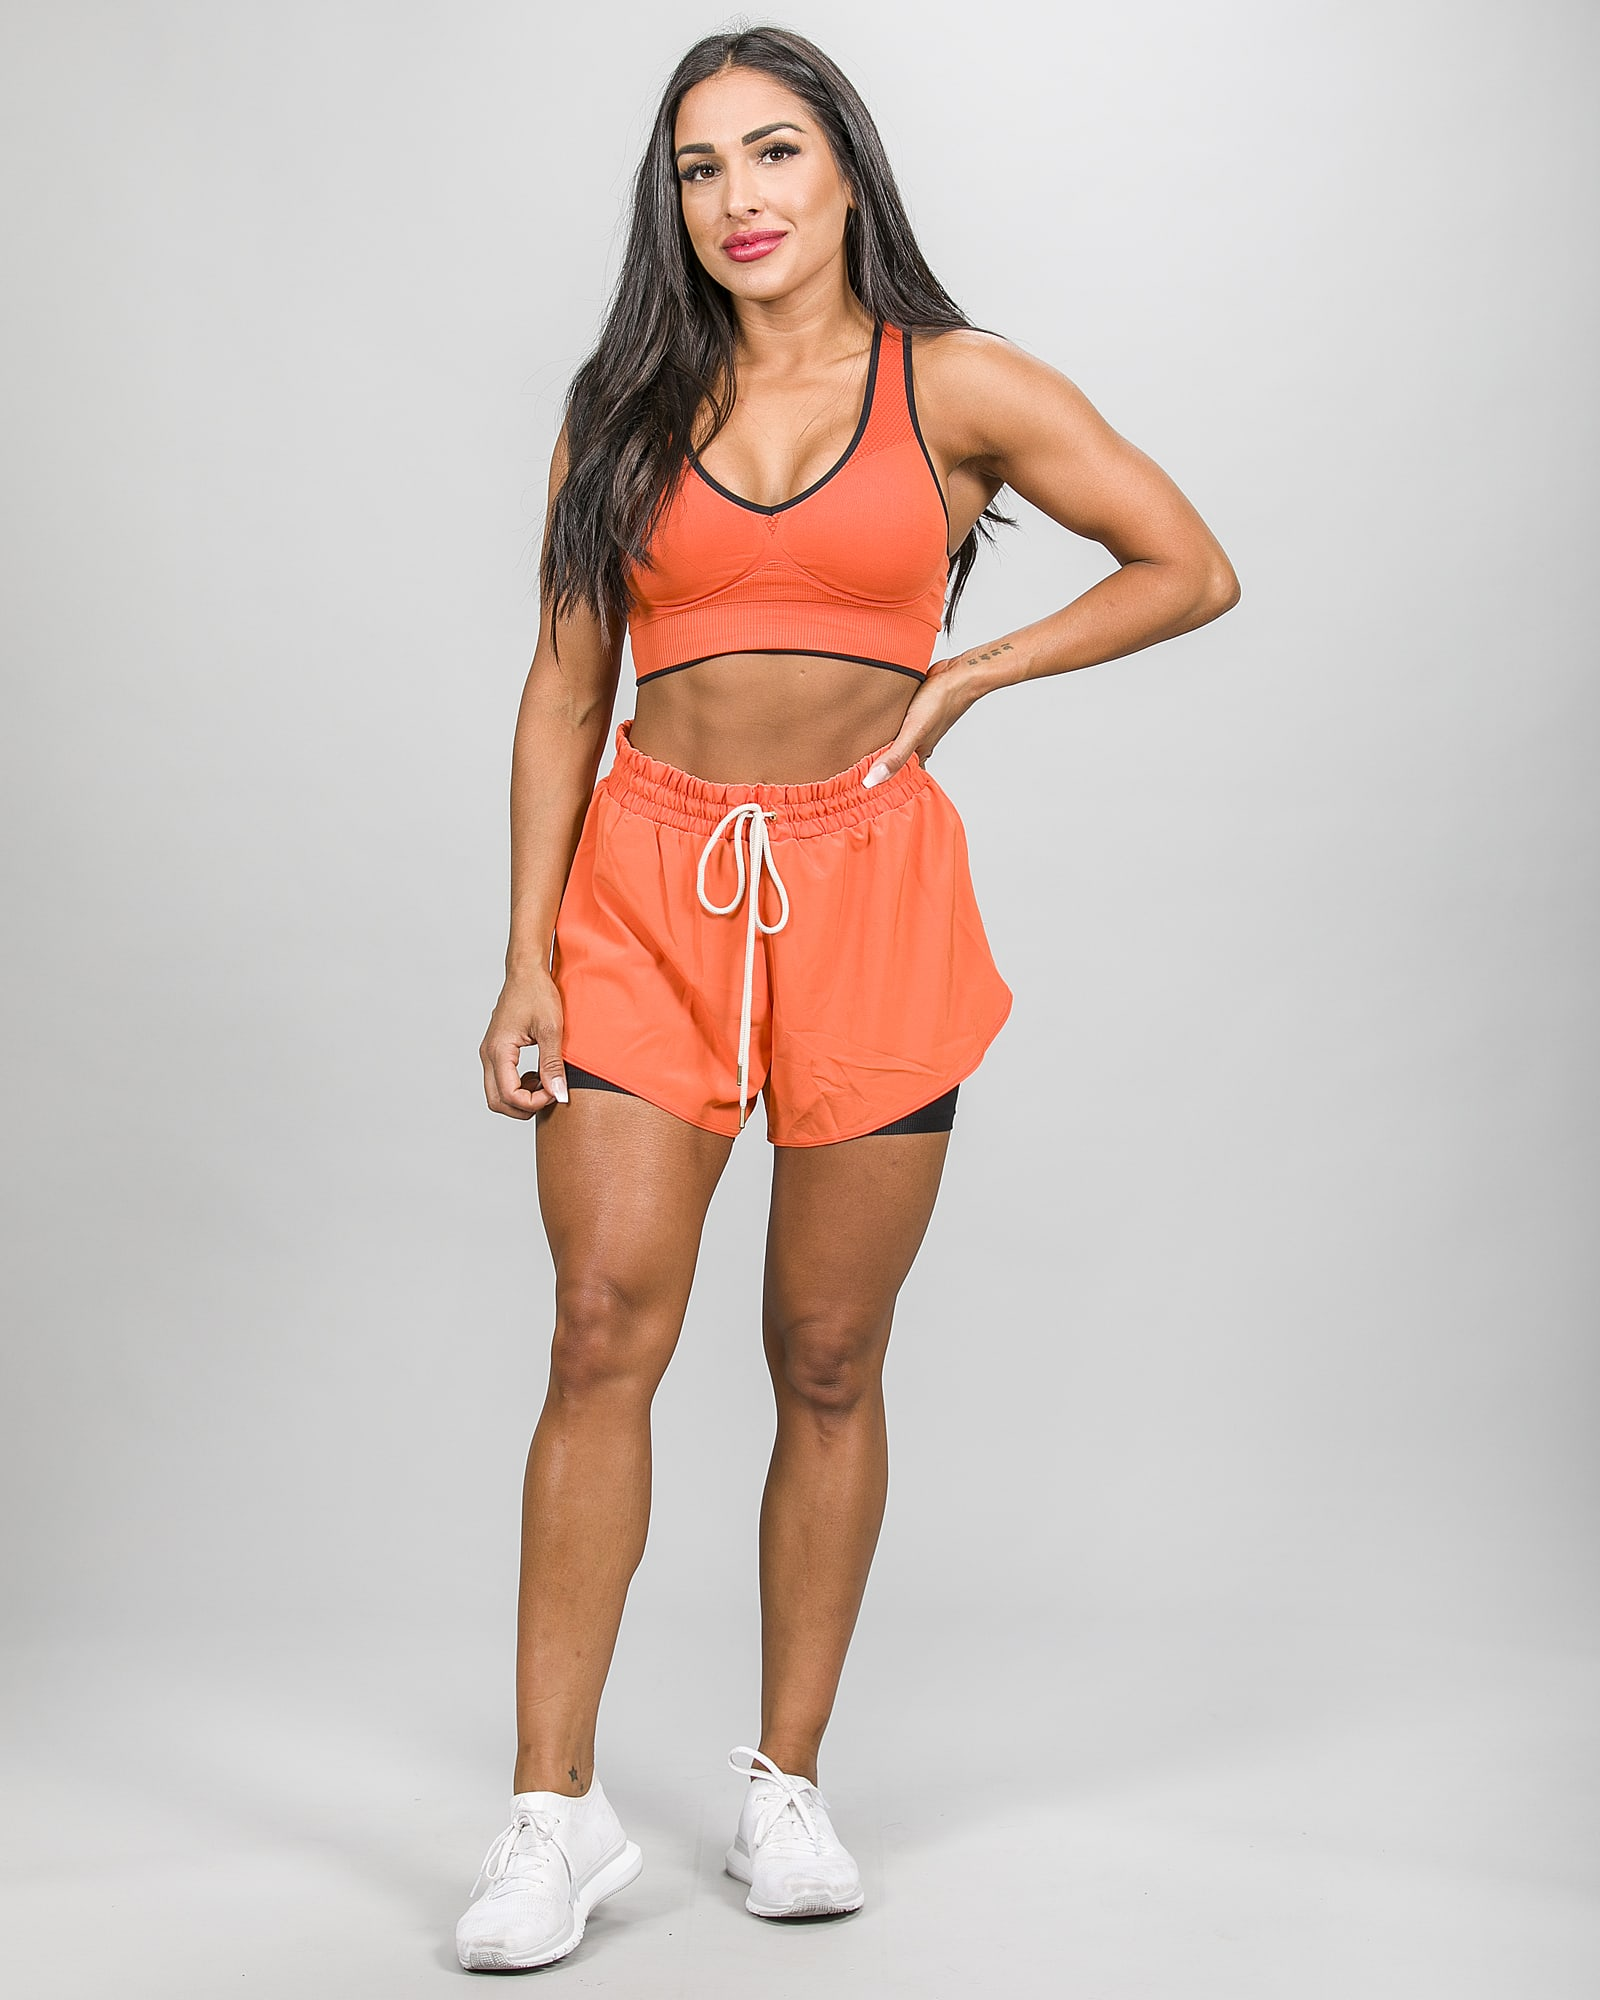 Skiny SK86 Shorts 083111and Crop Top 083094- Blazing Orange